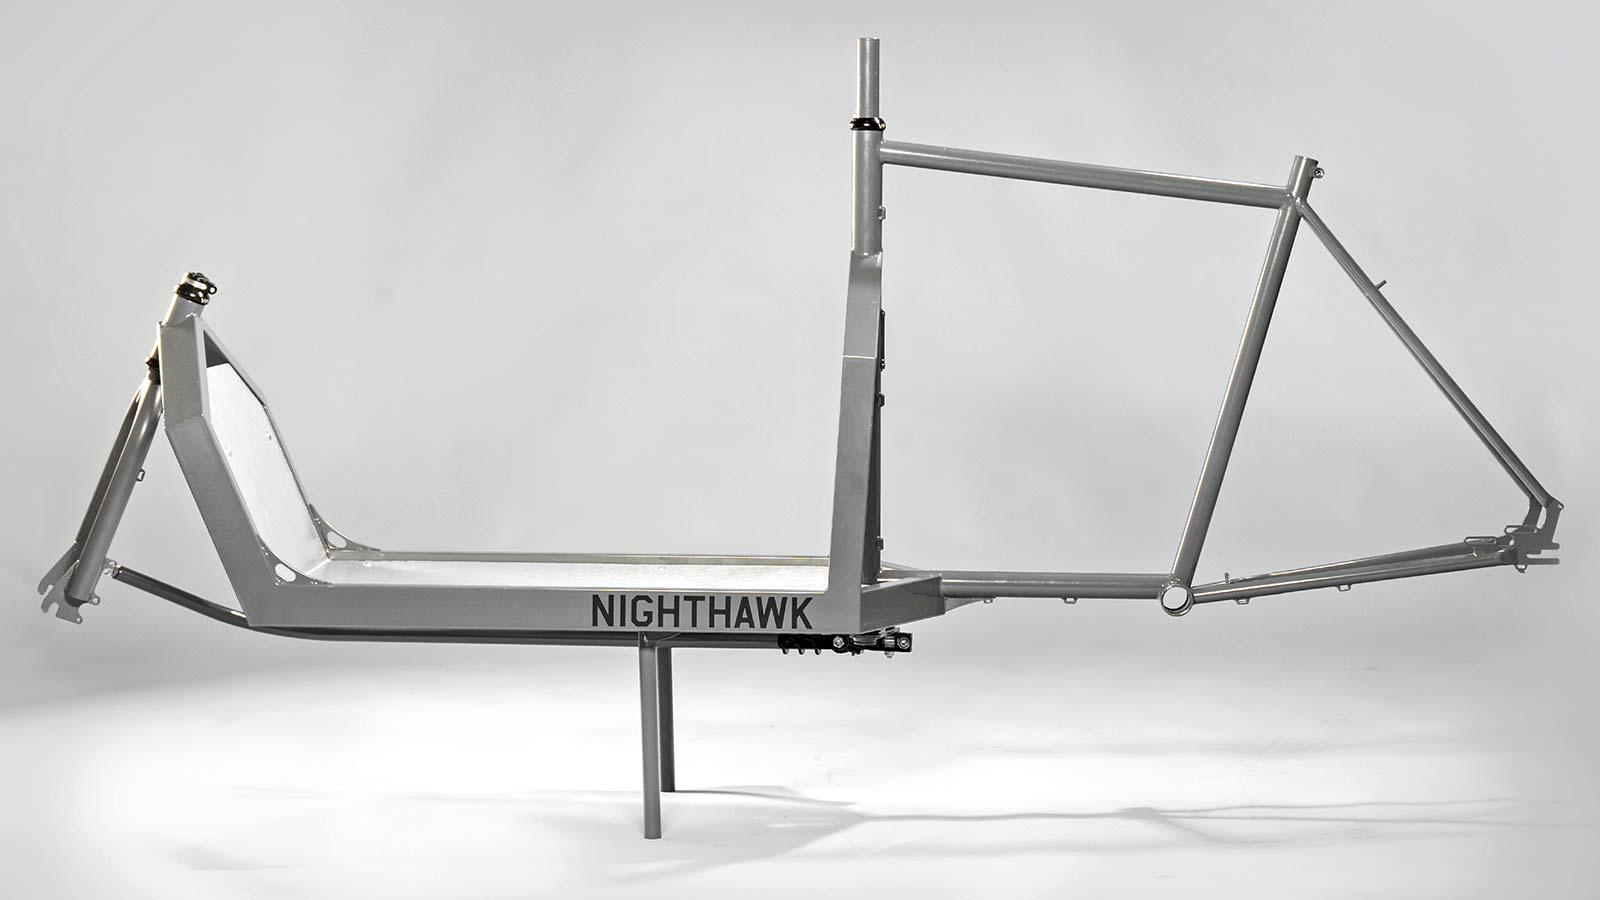 KP Cyclery Nighthawk steel cargo bike, affordable EU-made customizable long john cargo bikes,frameset